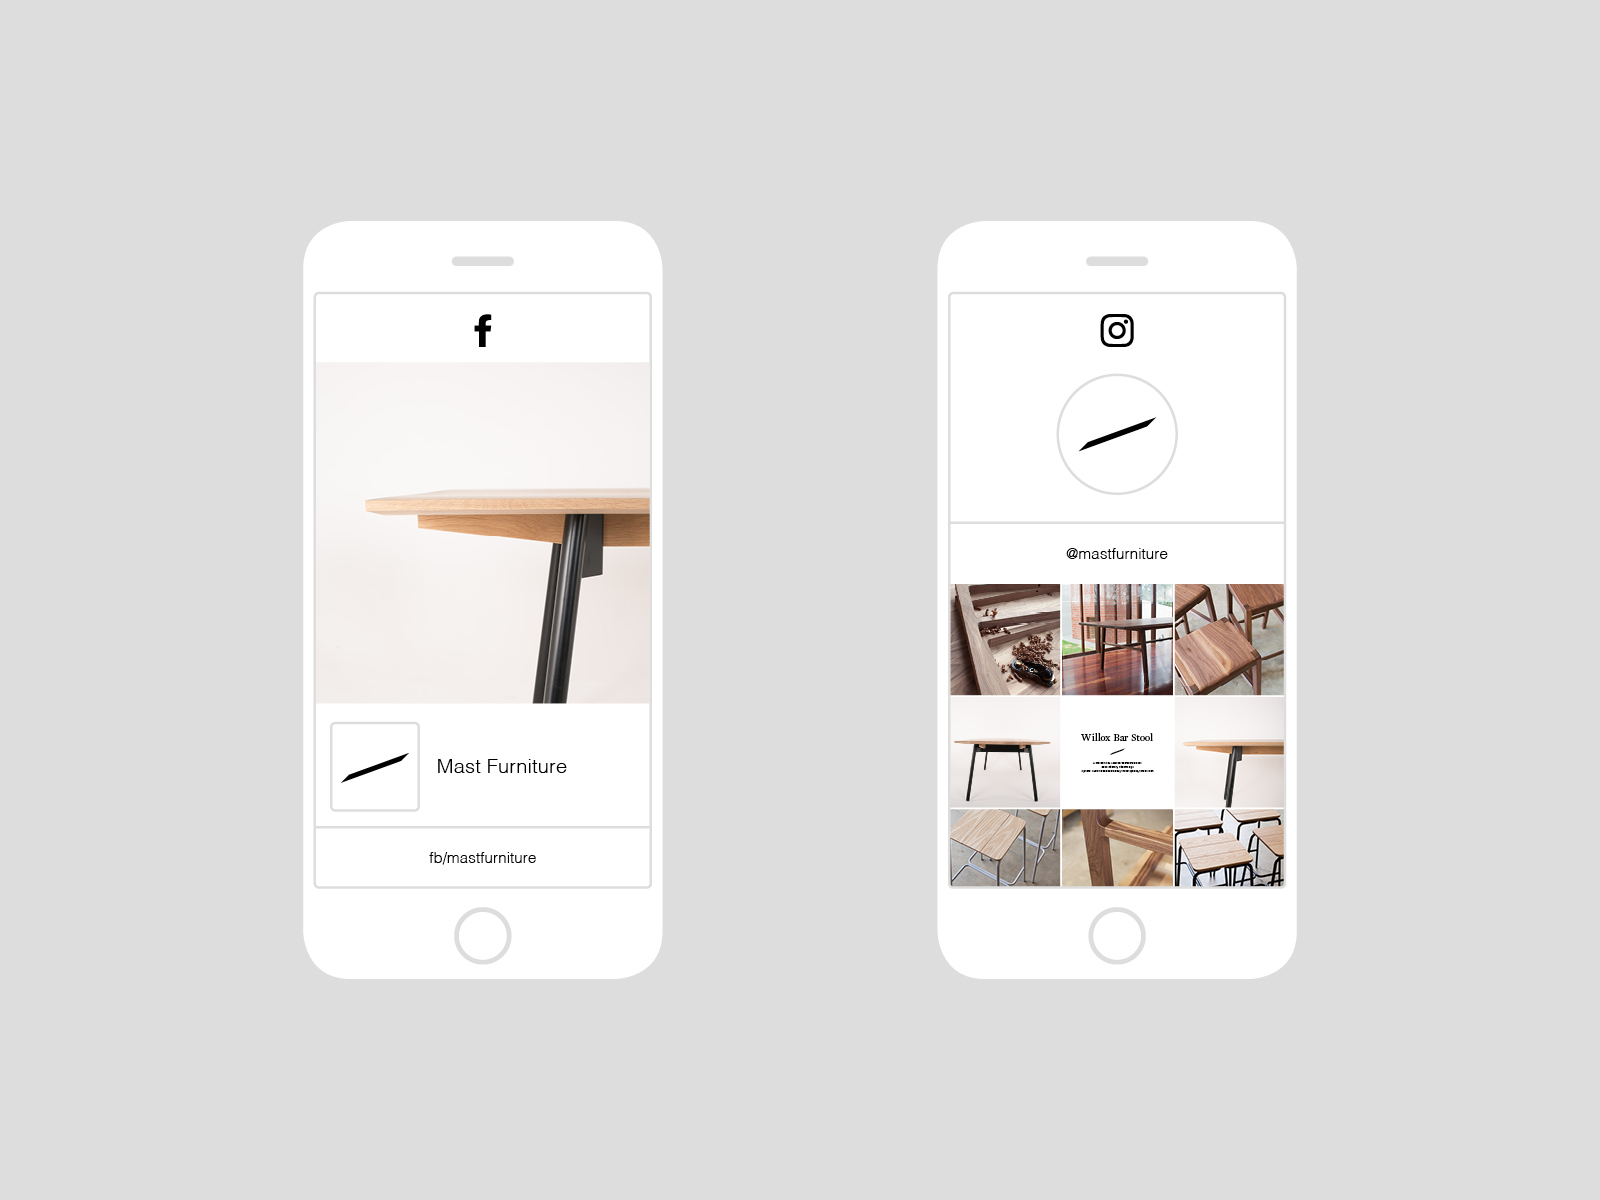 mast-furniture-8.jpg